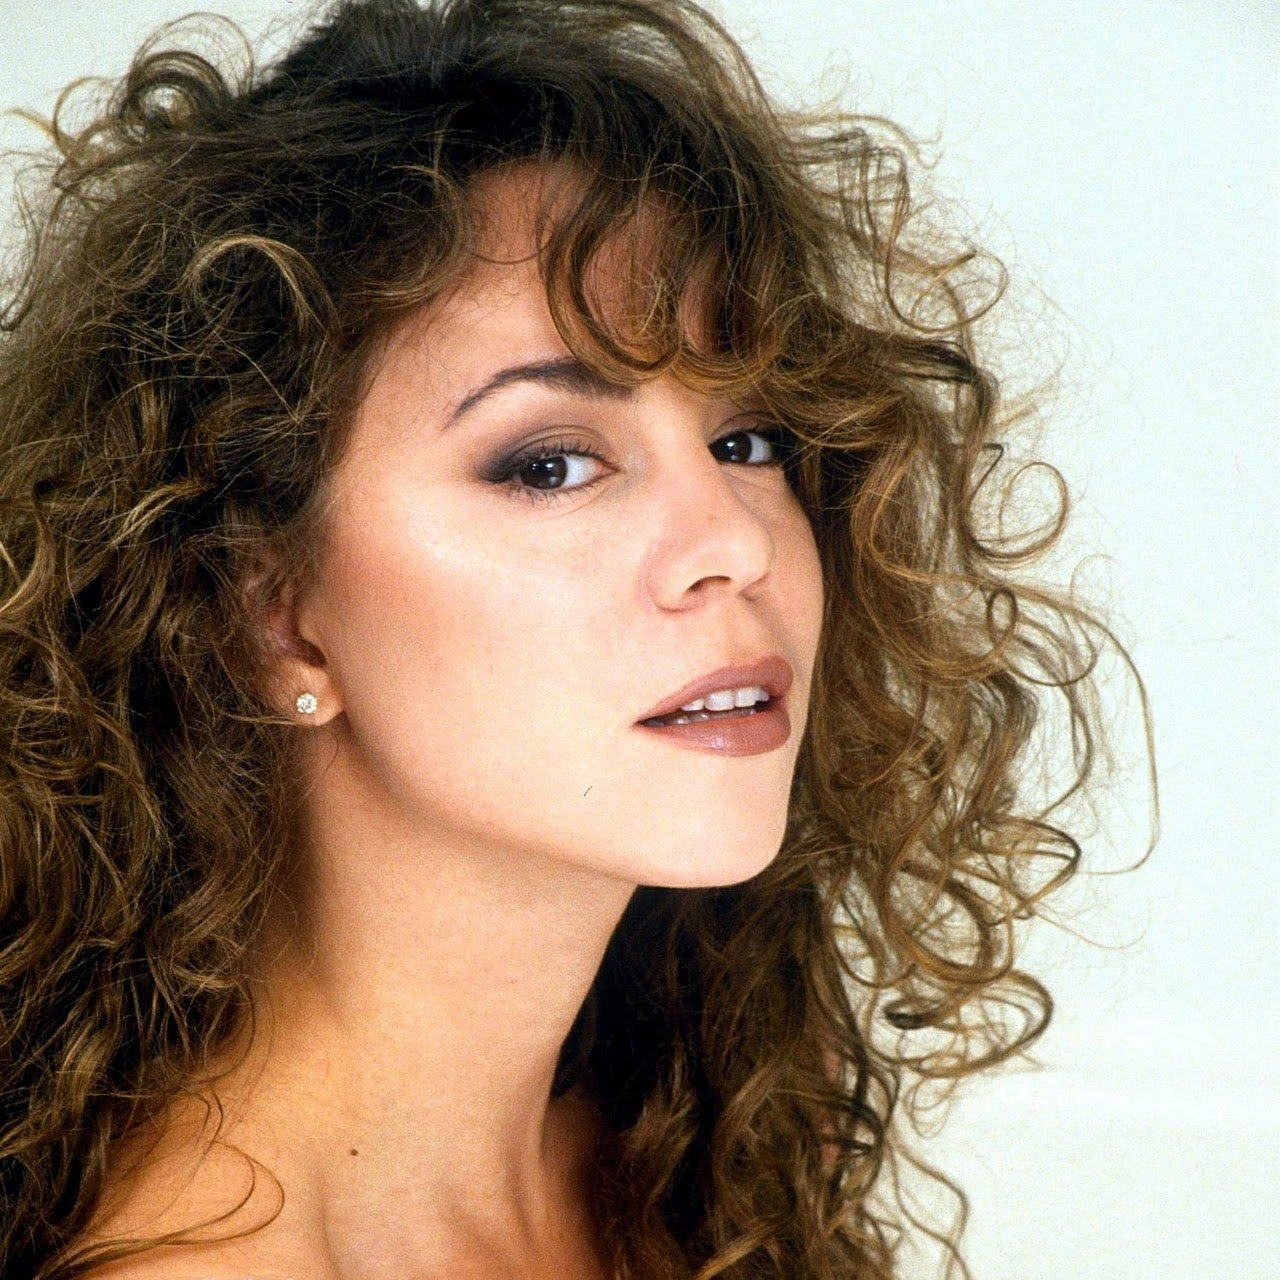 Who Is Mariah Carey?